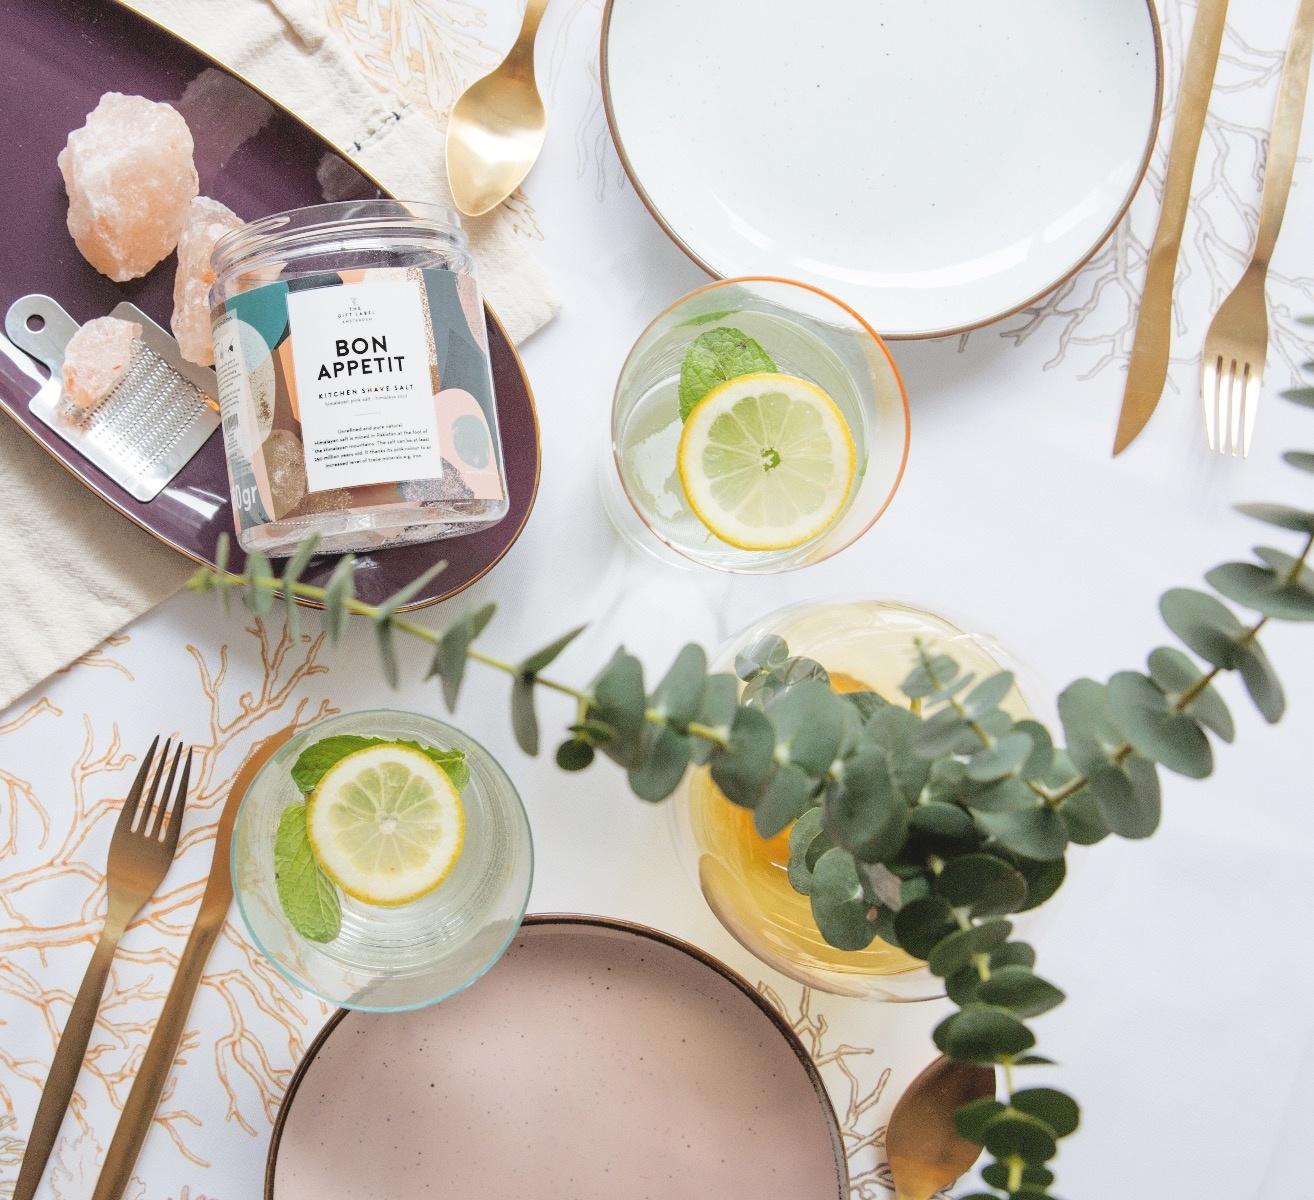 The Gift Label Table Salt Bon Appetit